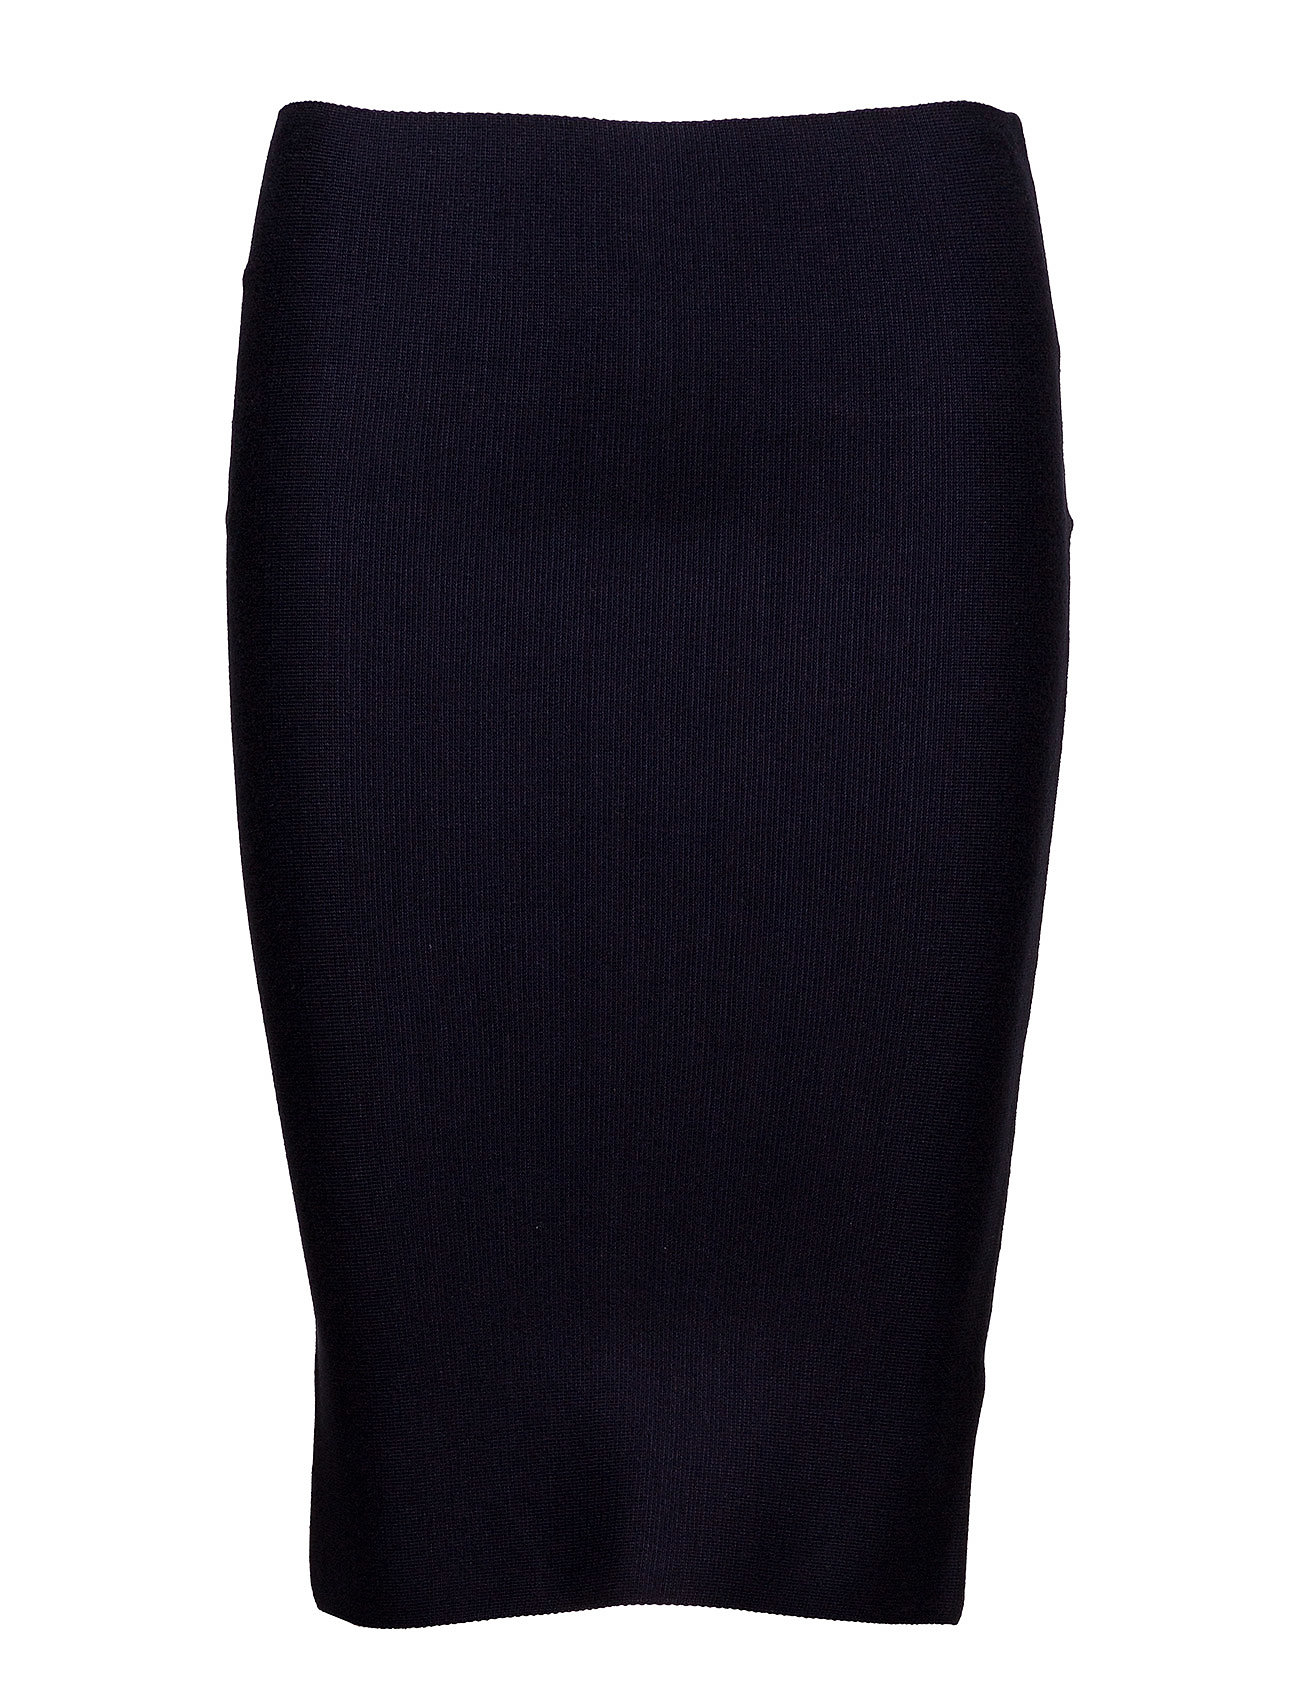 591b0d7c3 Henrietta Tube Skirt (Night Sky) (24.98 €) - Soft Rebels - | Boozt.com